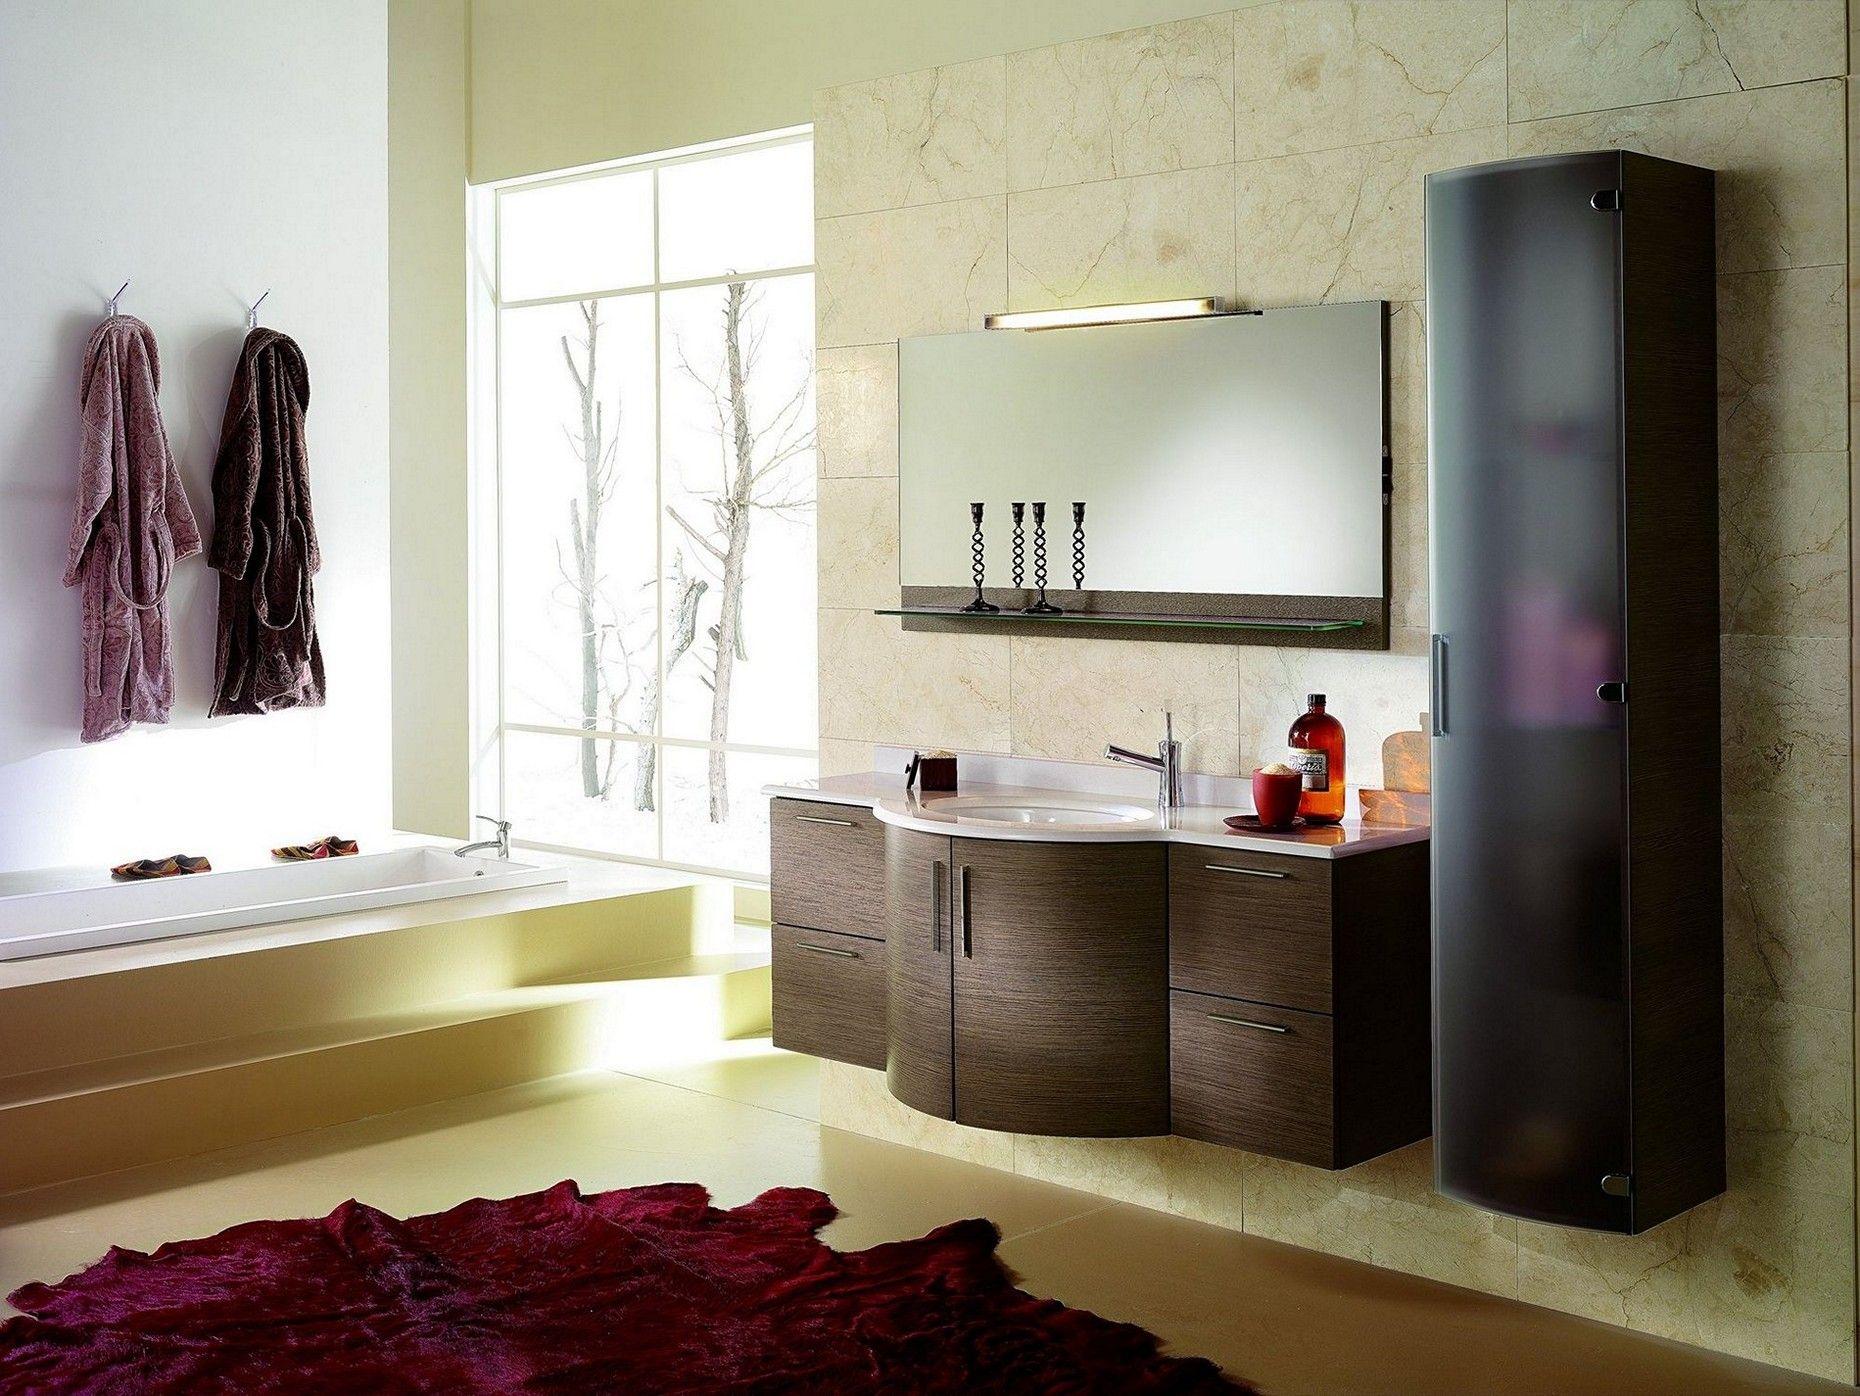 elegant bathroom ideas photo gallery wallpaper traditional fireplace ...